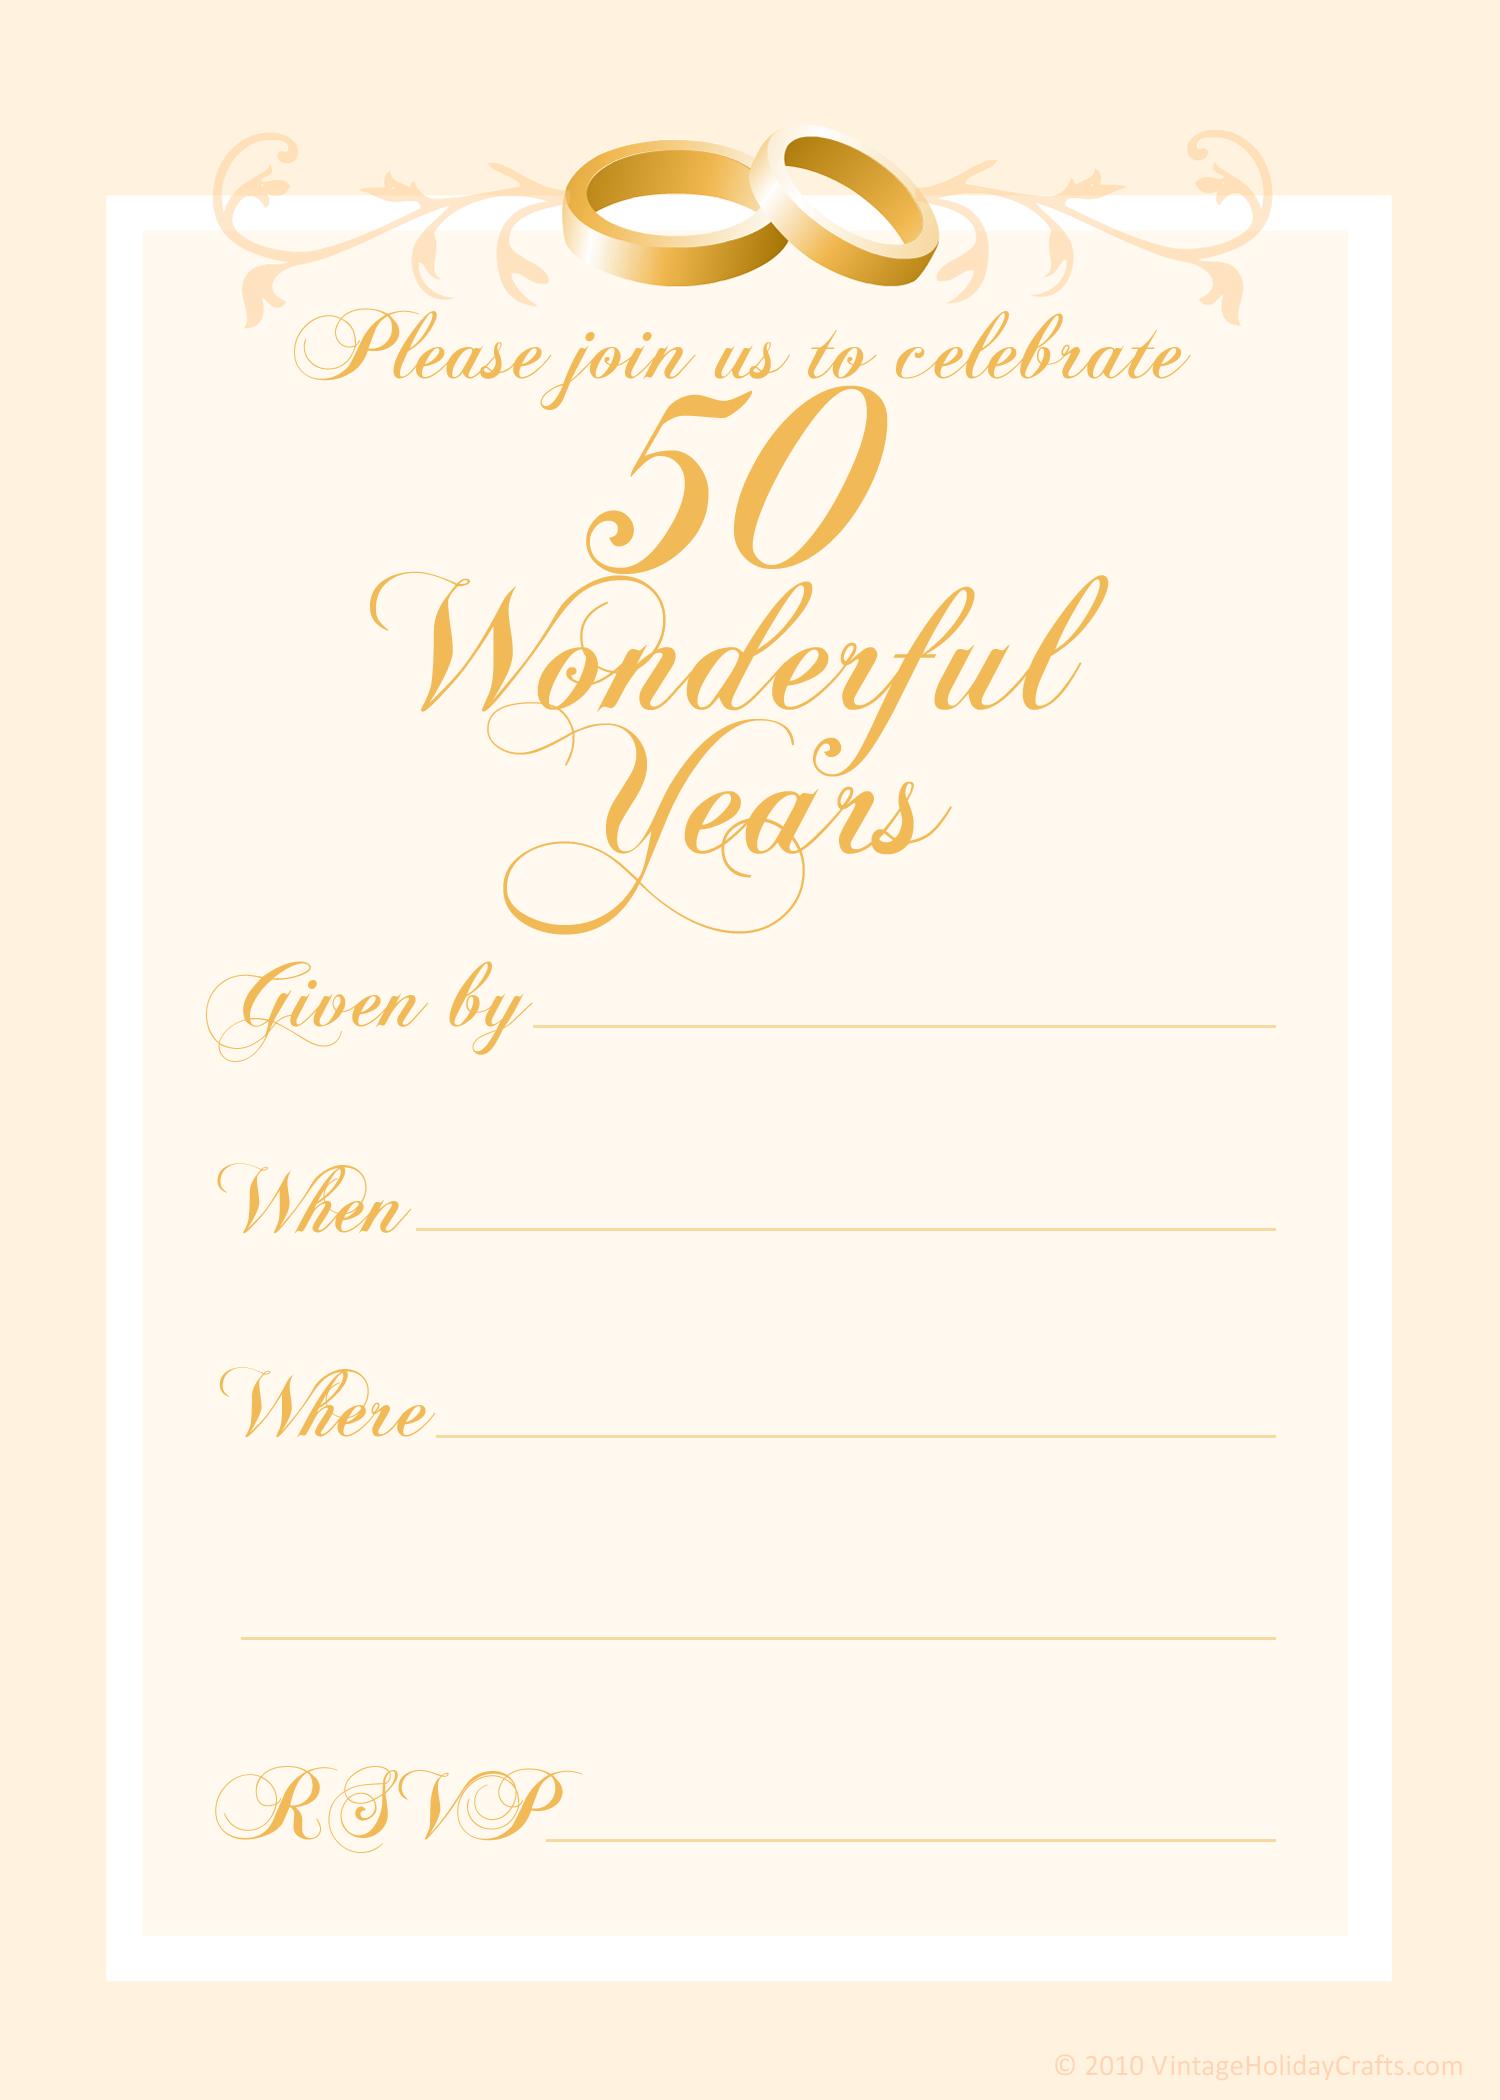 50th Anniversary Templates Free